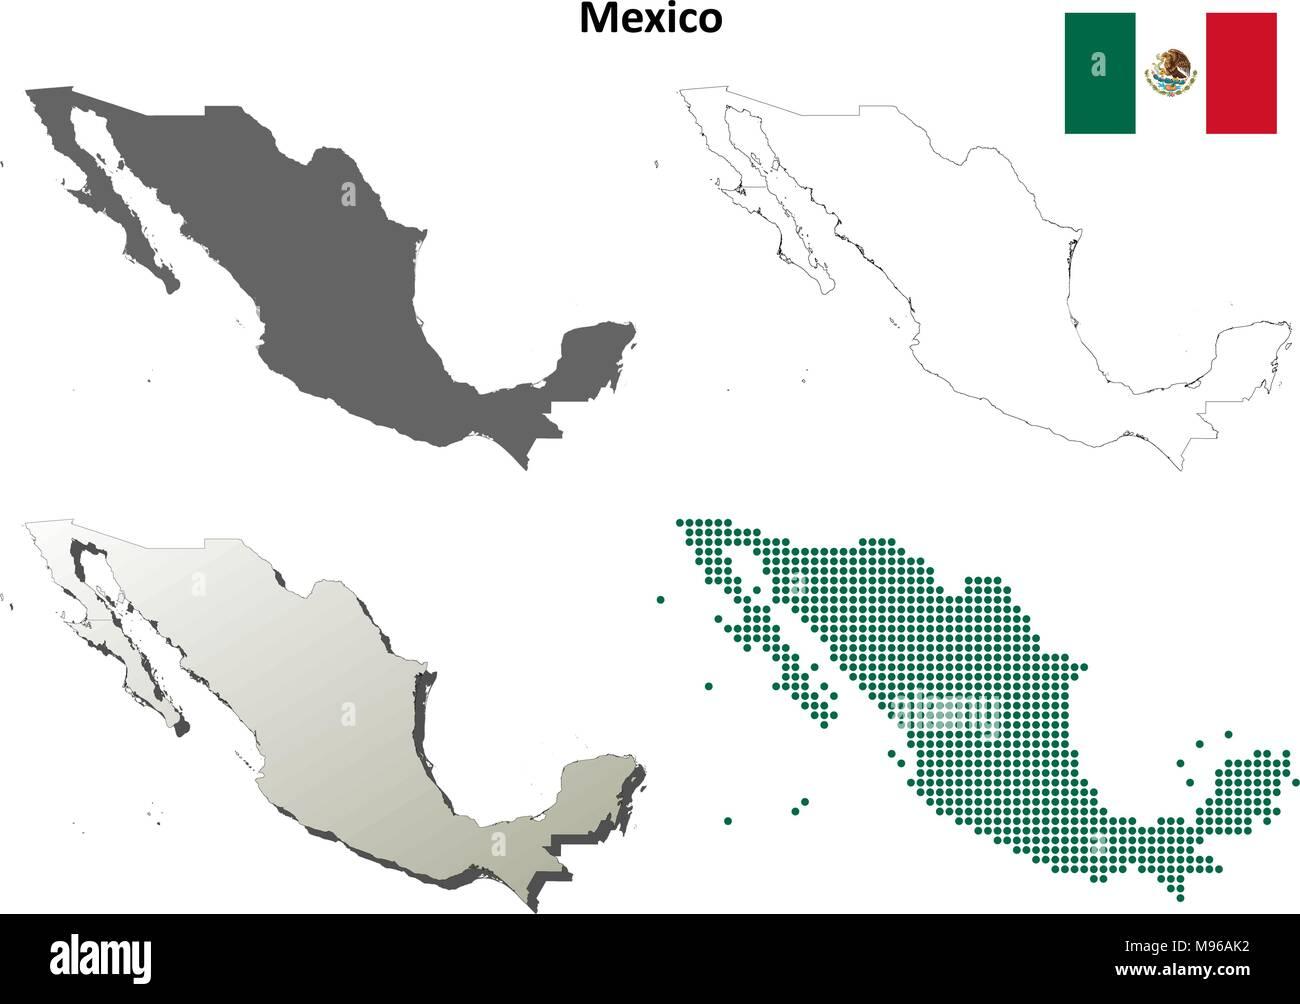 Mexiko Karte Umriss.Mexiko Umriss Karte Gesetzt Vektor Abbildung Bild